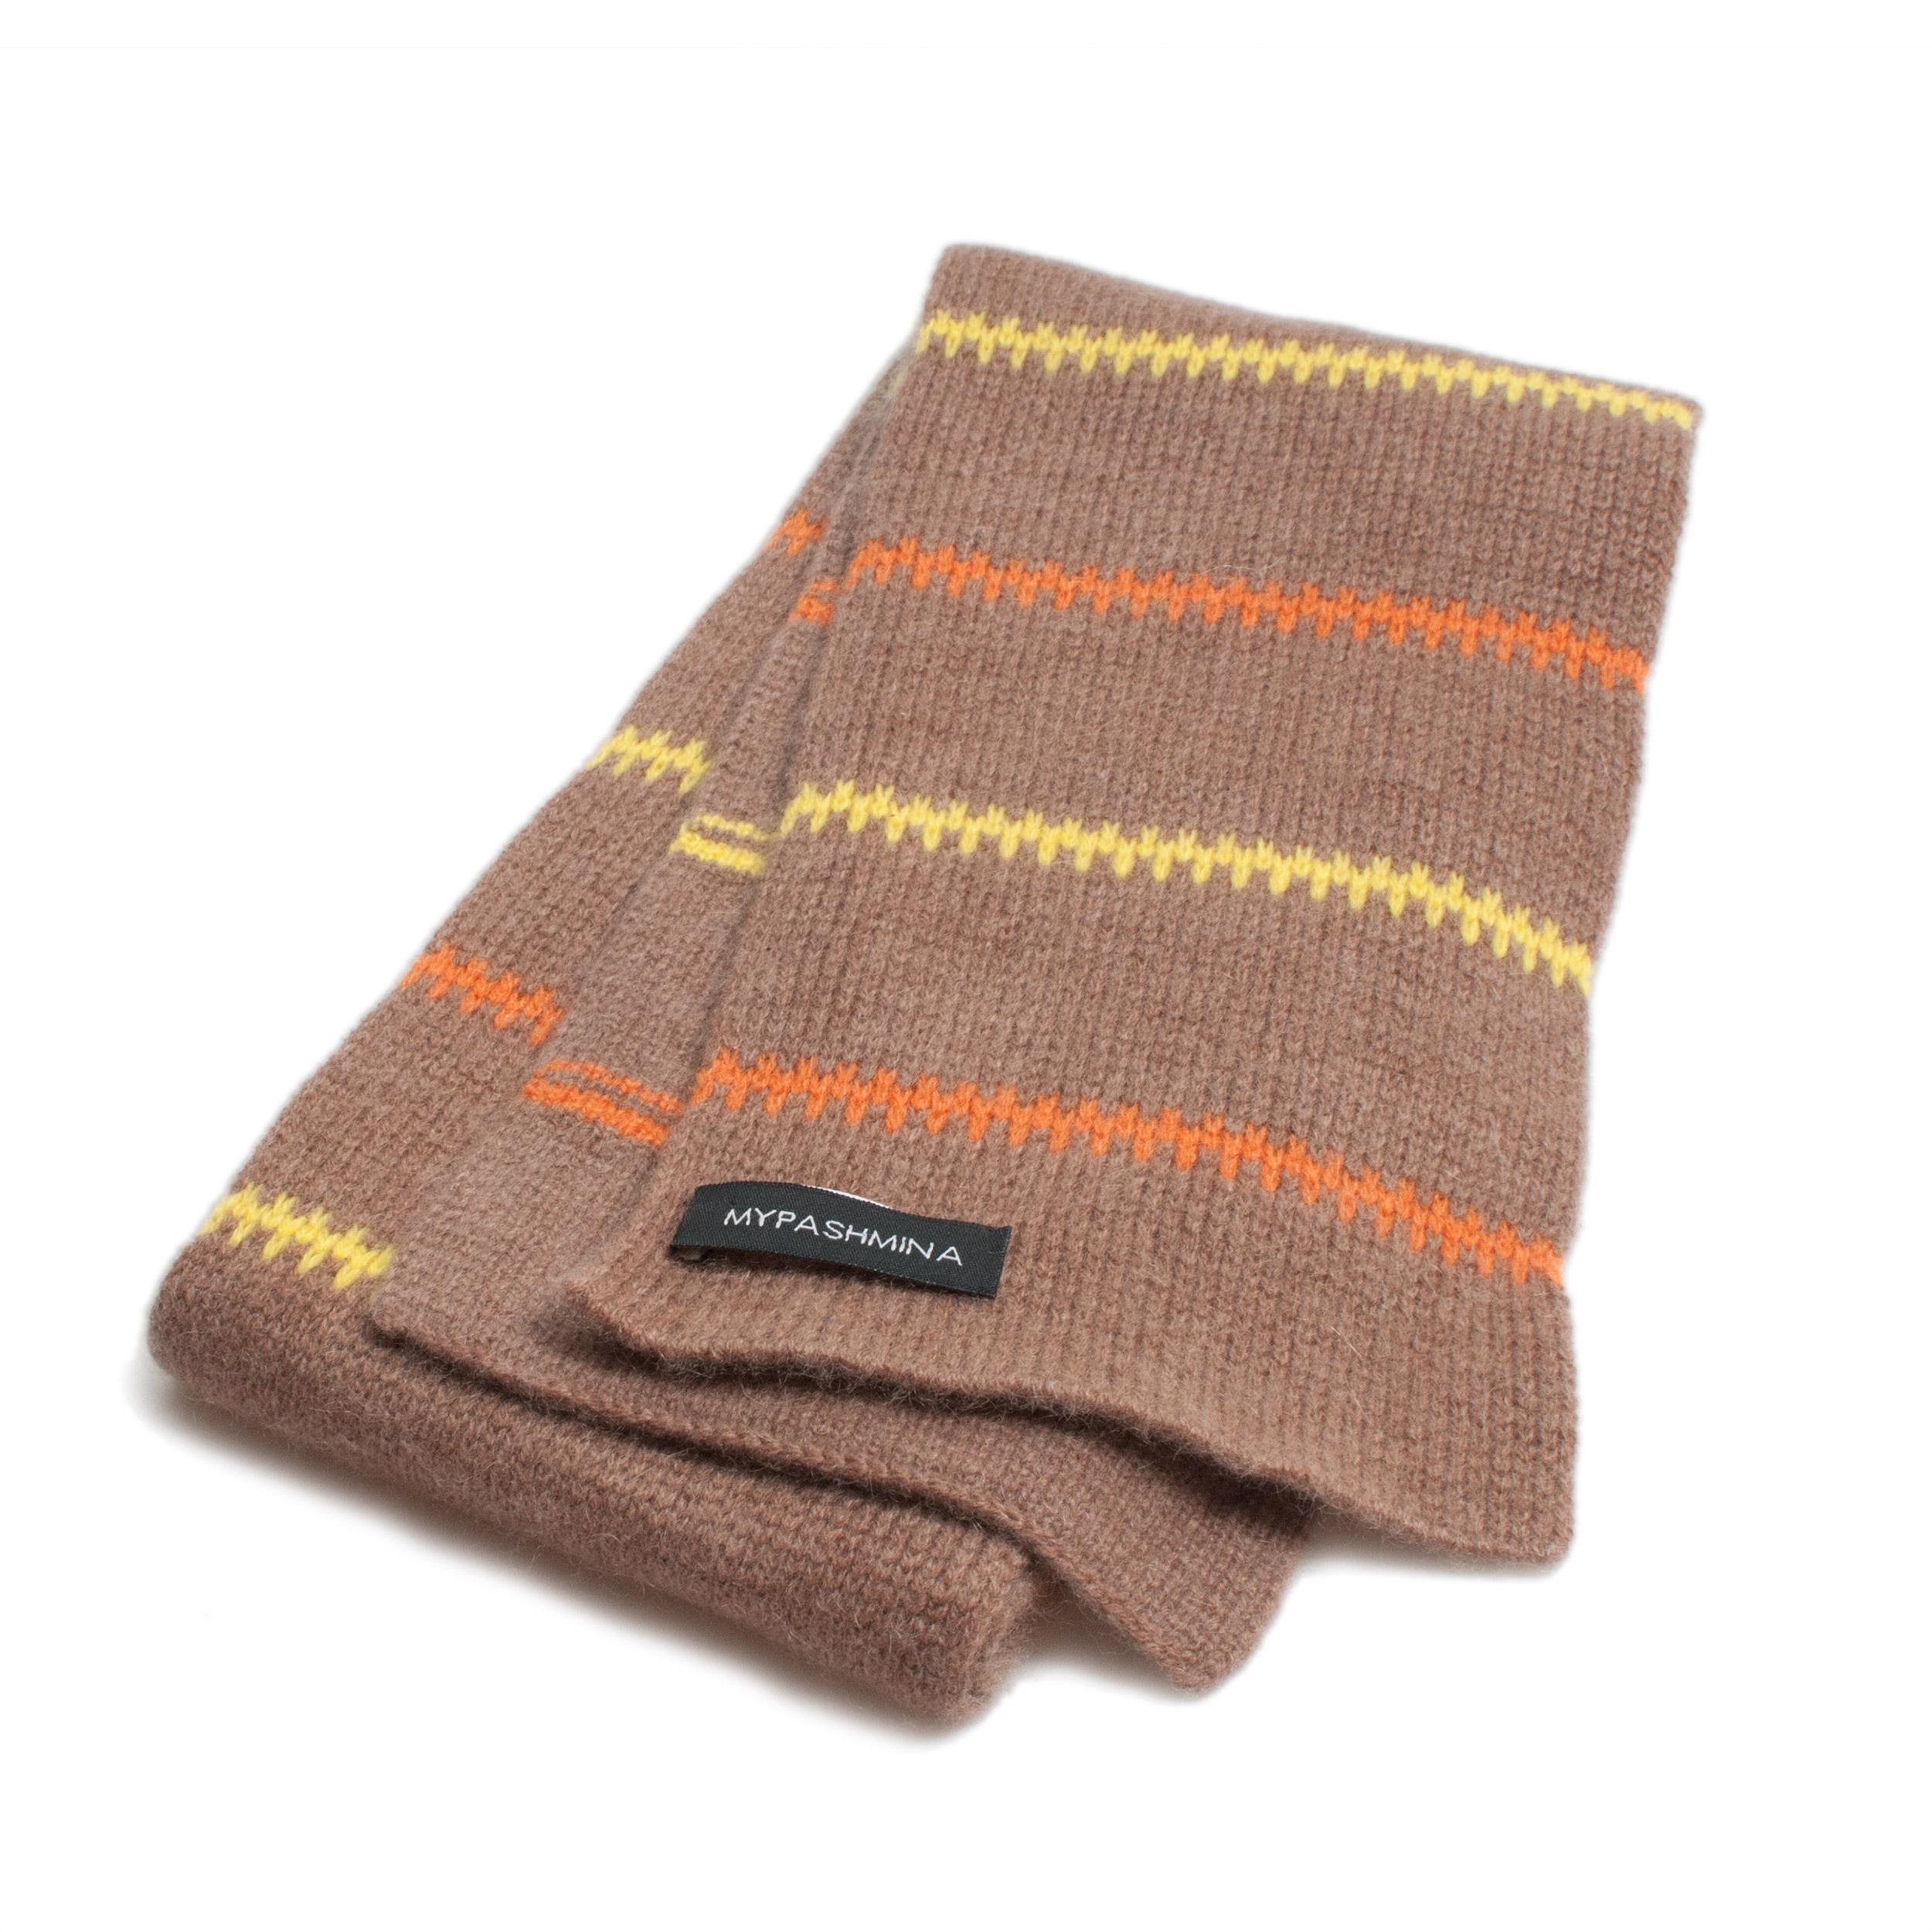 Buy Pippi-halsduk i kashmir - brun orange gul Online - Mypashmina.se ed296500f2f7a